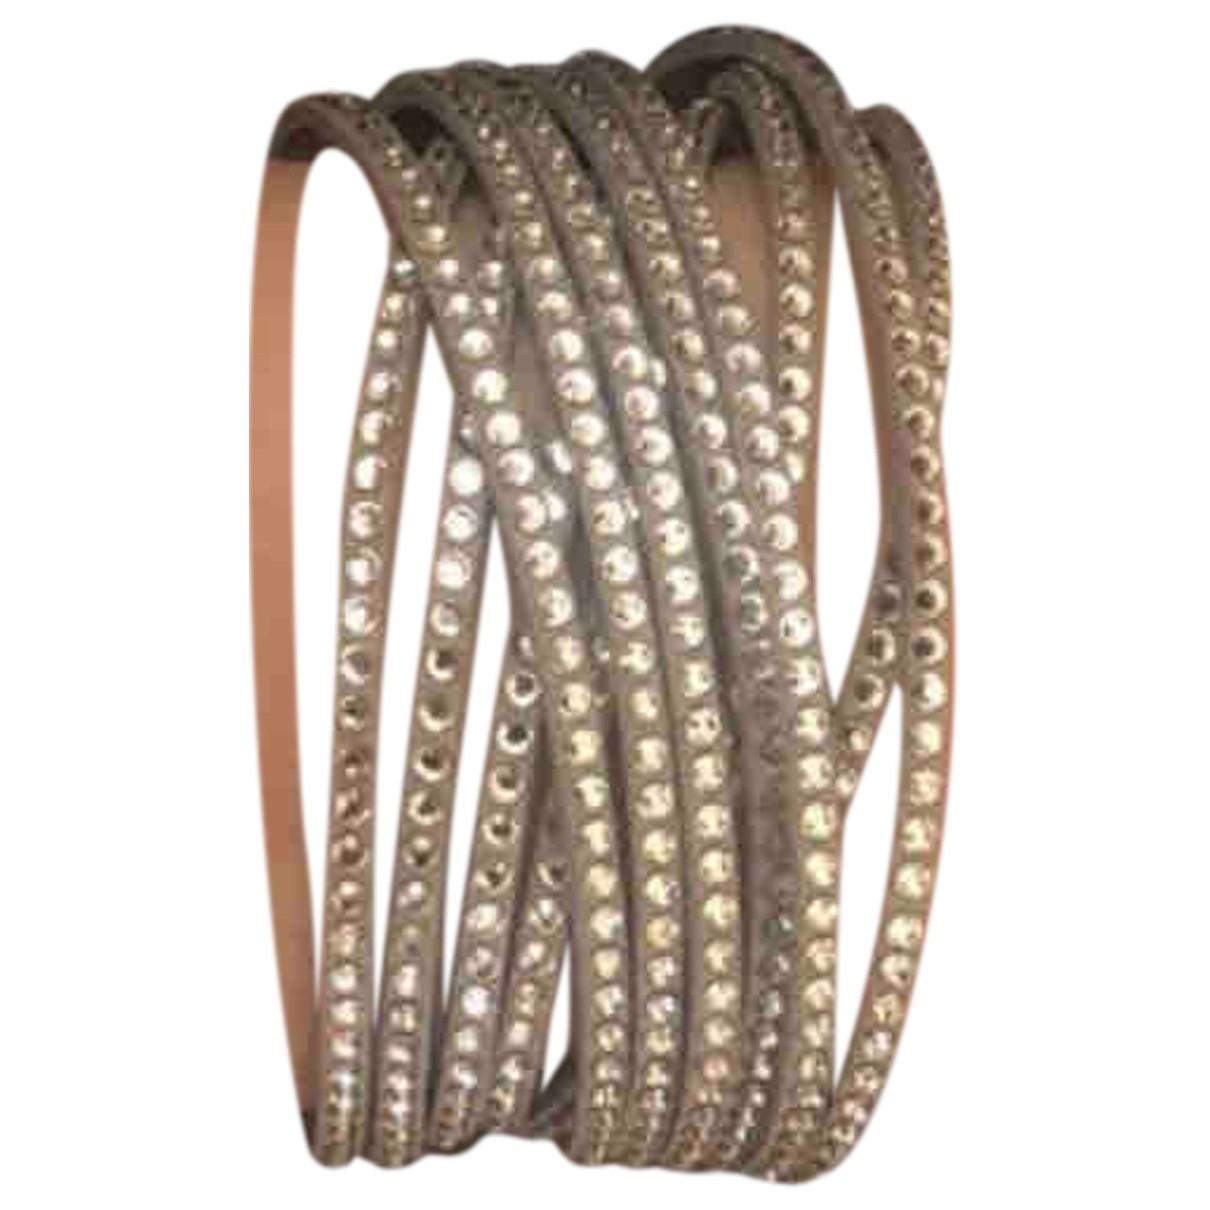 Swarovski Slake Armband in  Grau Leder